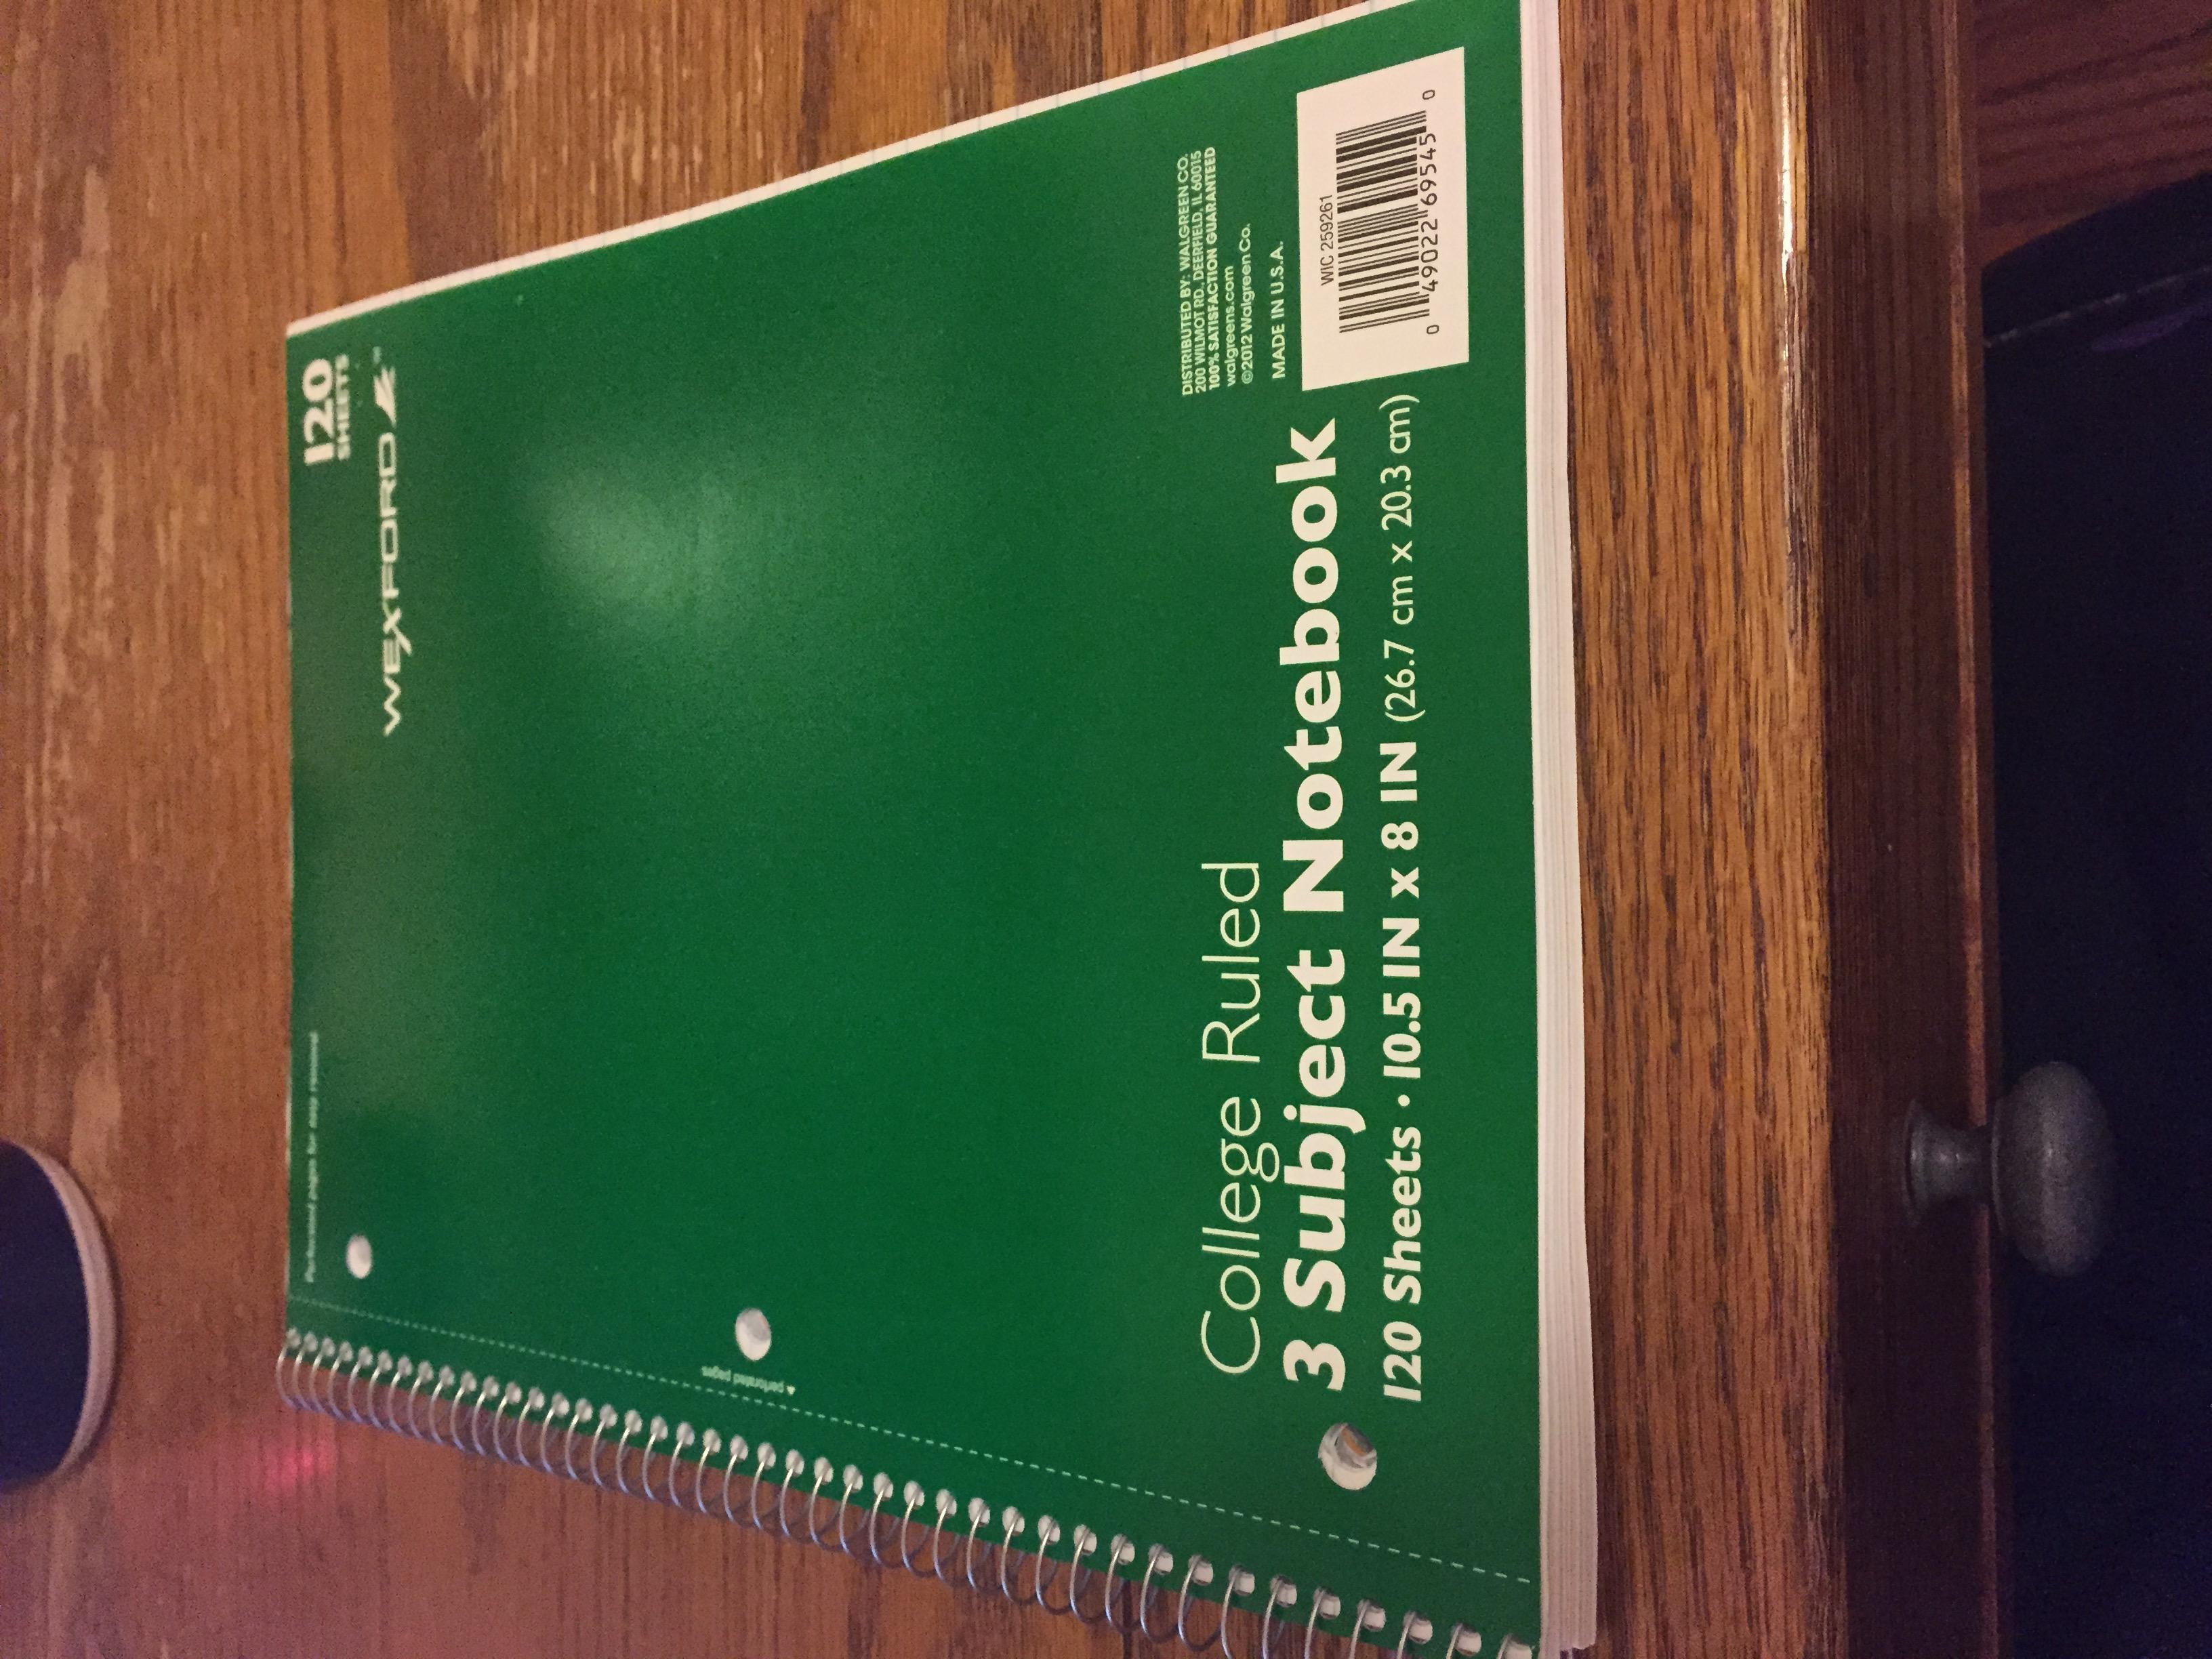 nicolas cole new notebook